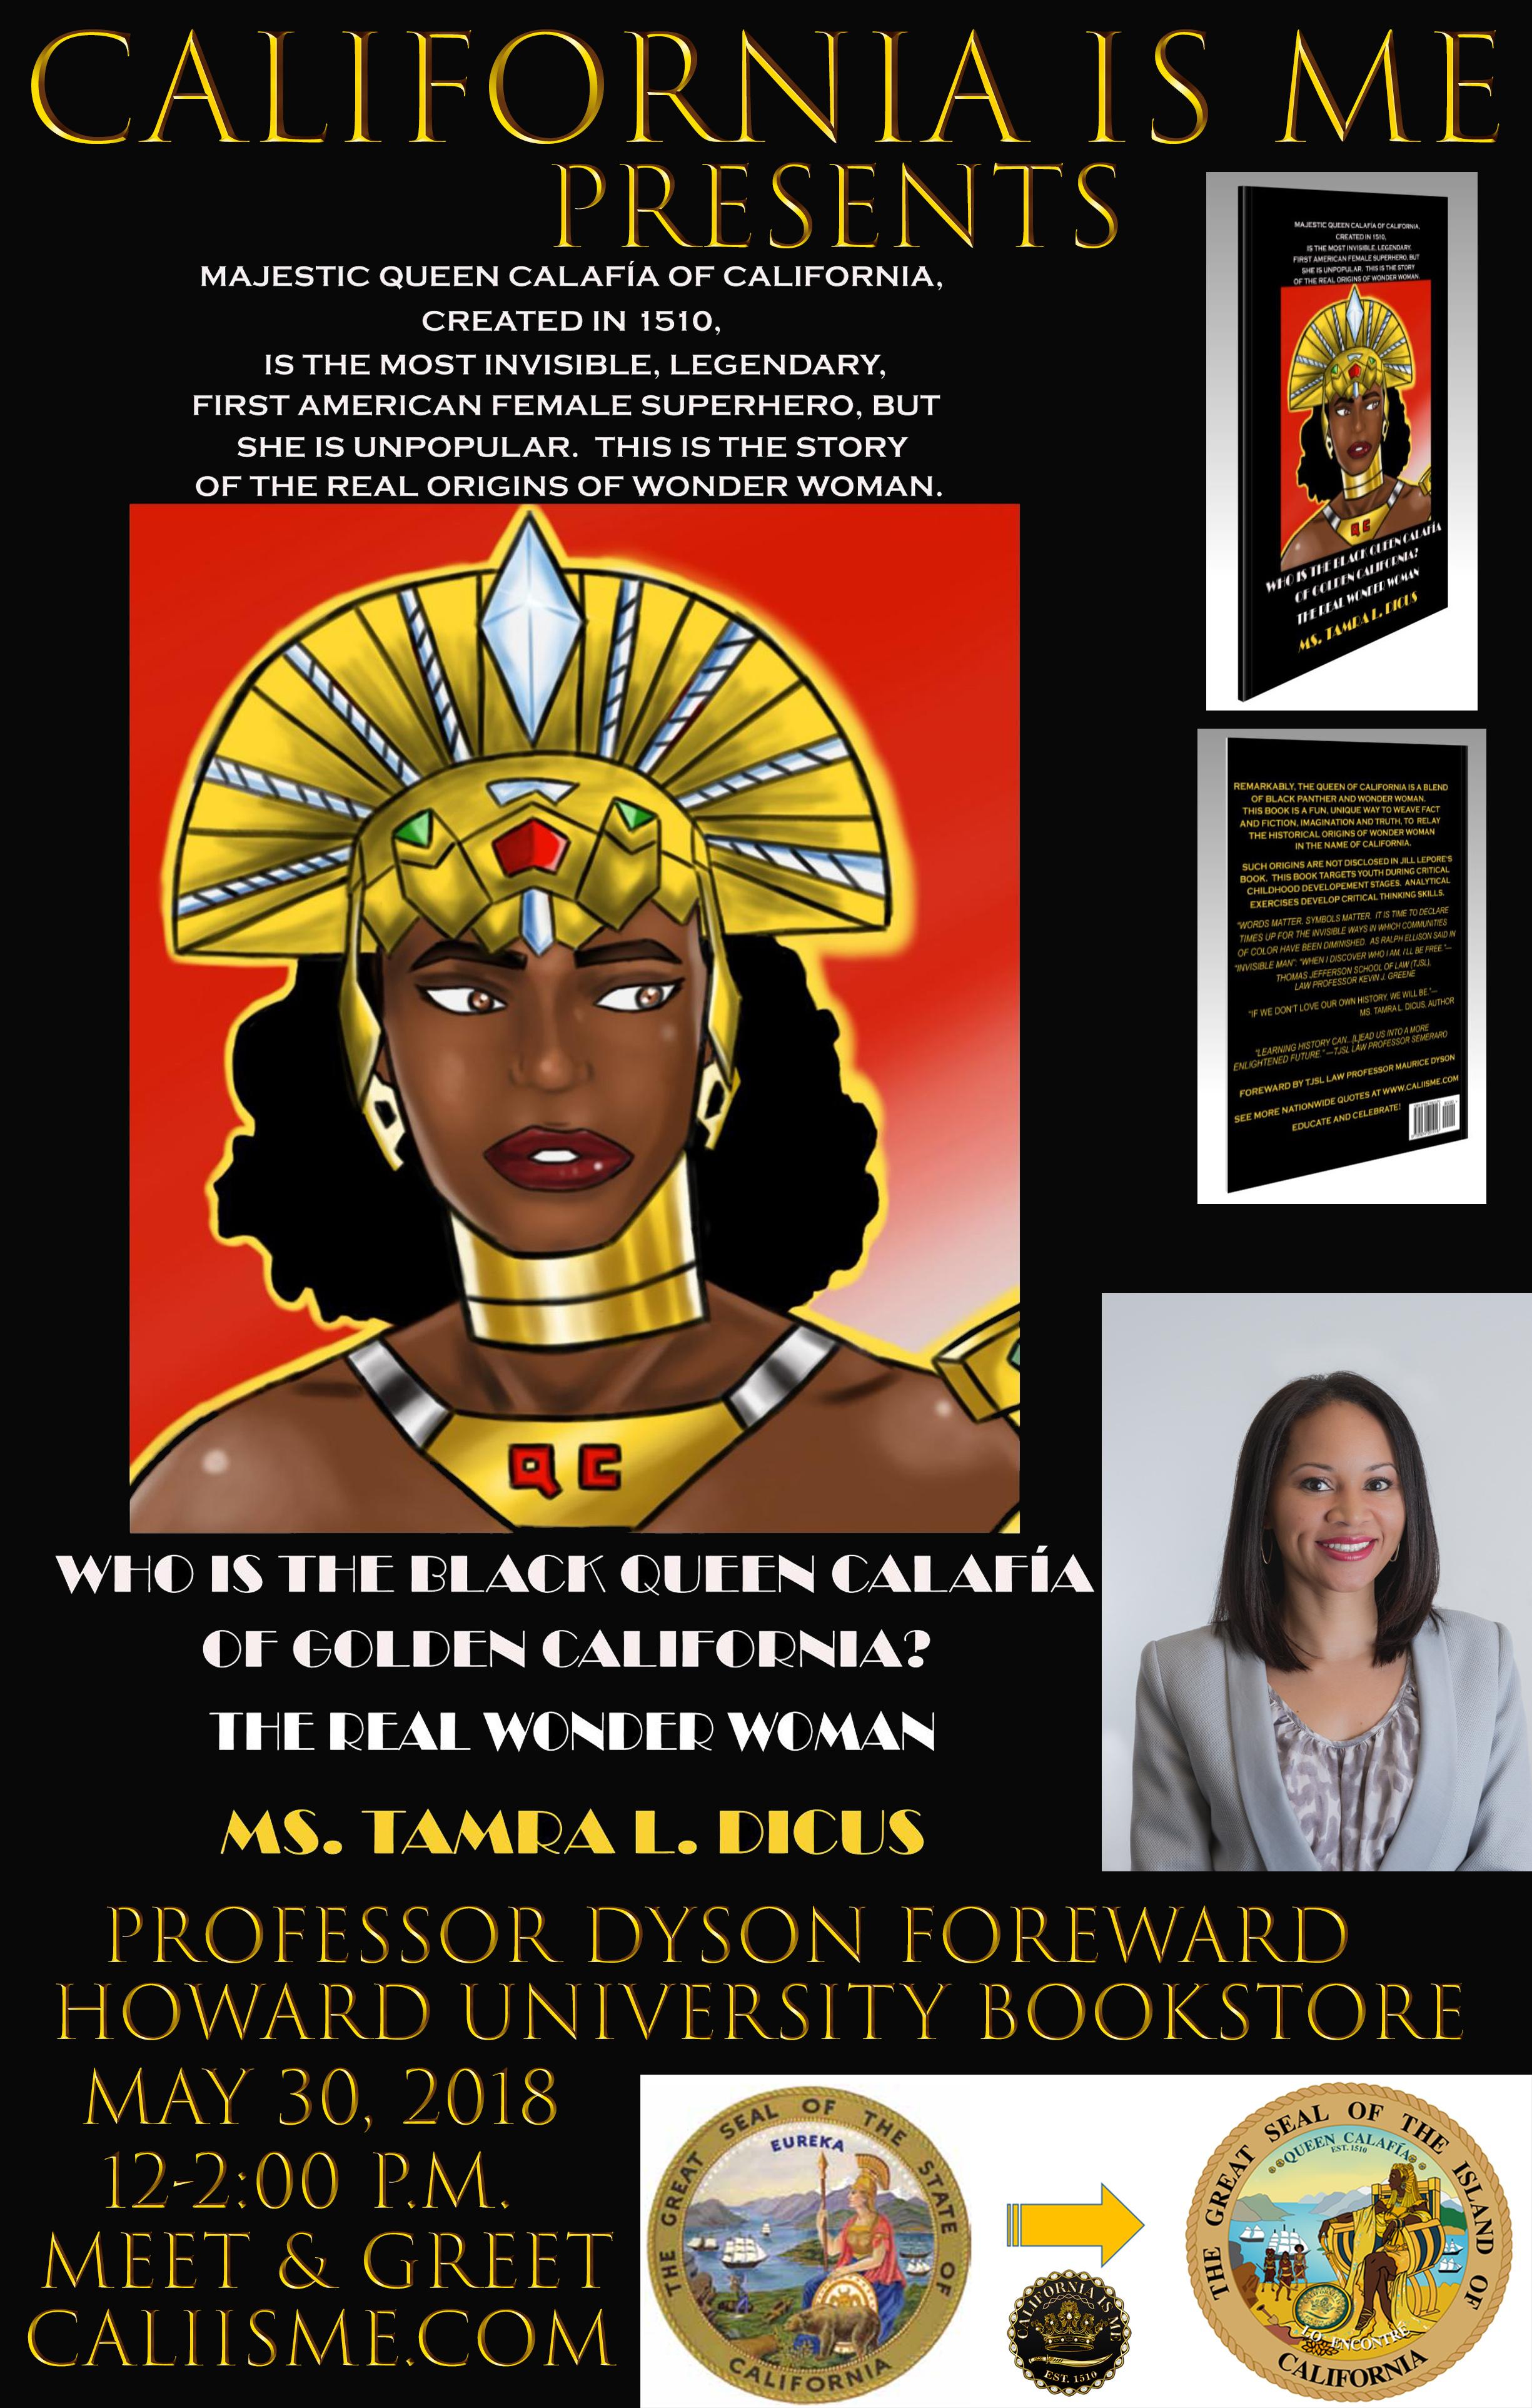 poster who is black queen calafia book HU flyer Book sigining.jpg